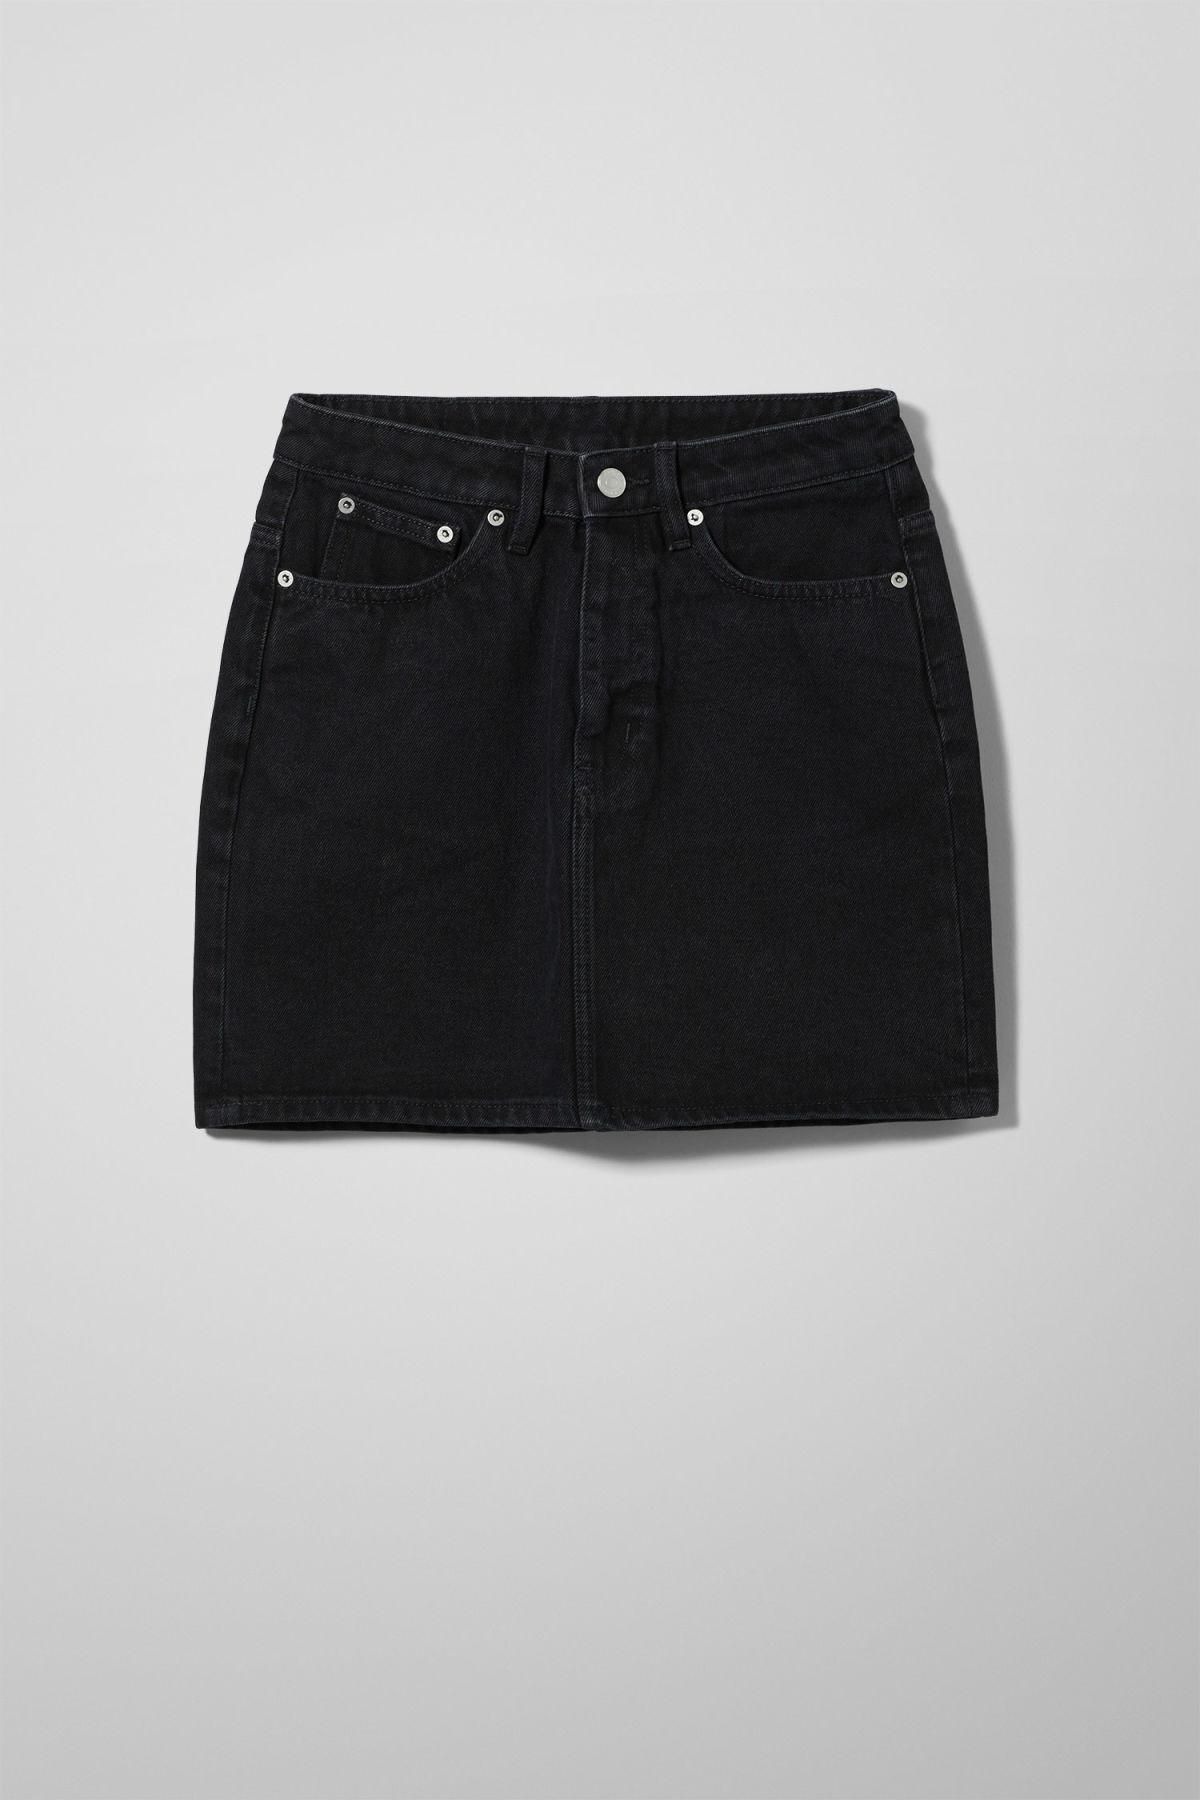 Wend Black Denim Skirt - Black